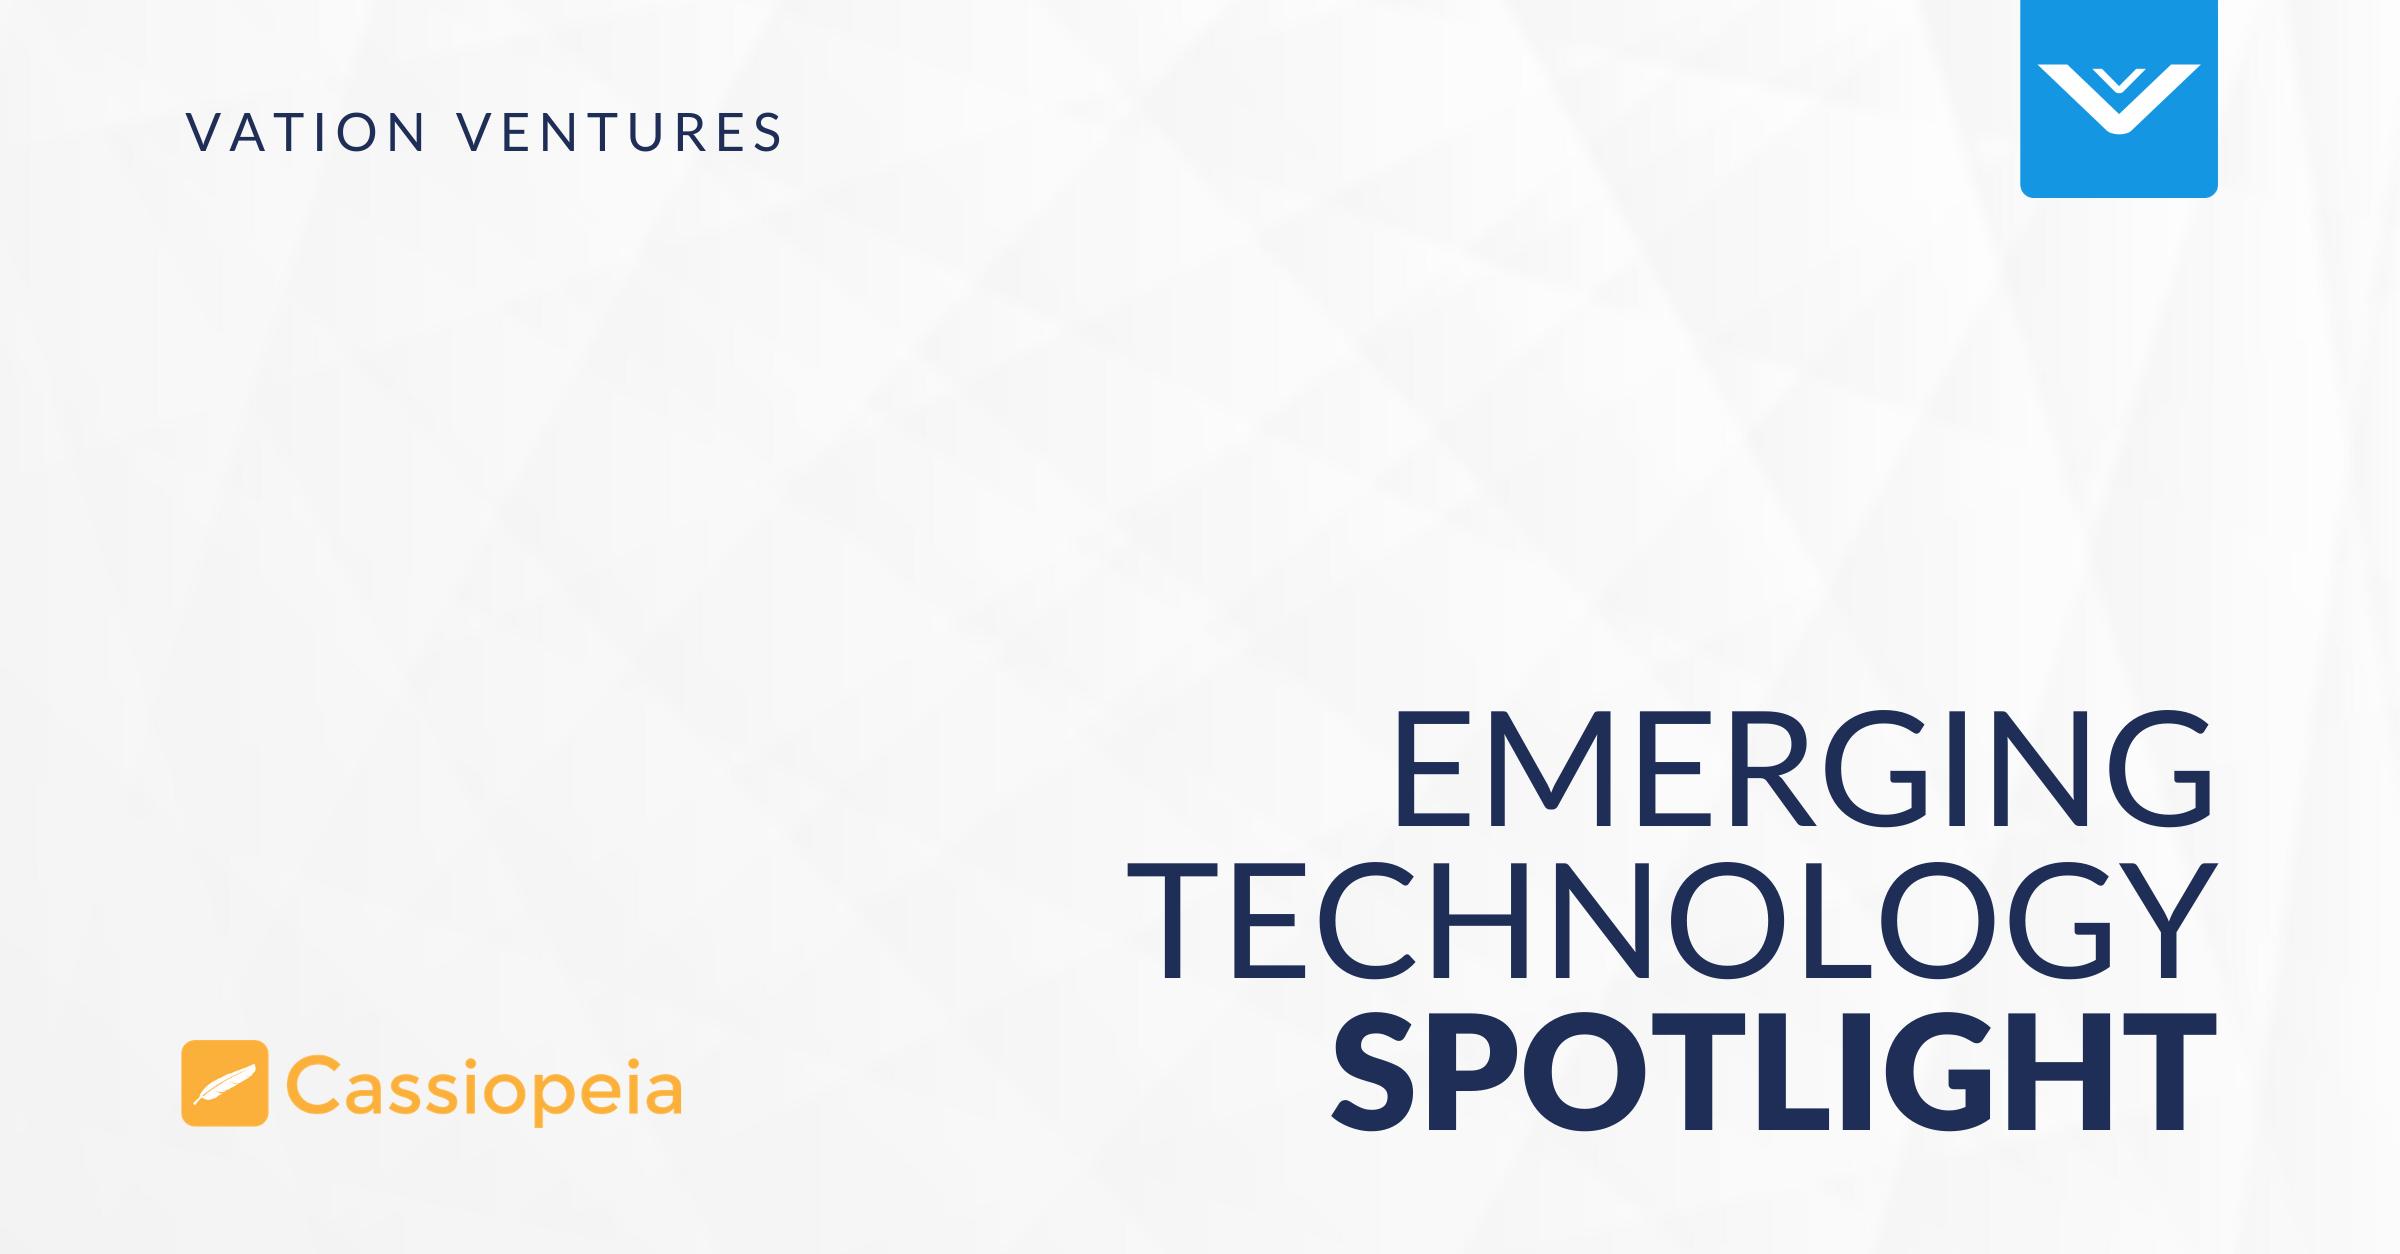 Emerging Technology Spotlight: Cassiopeia